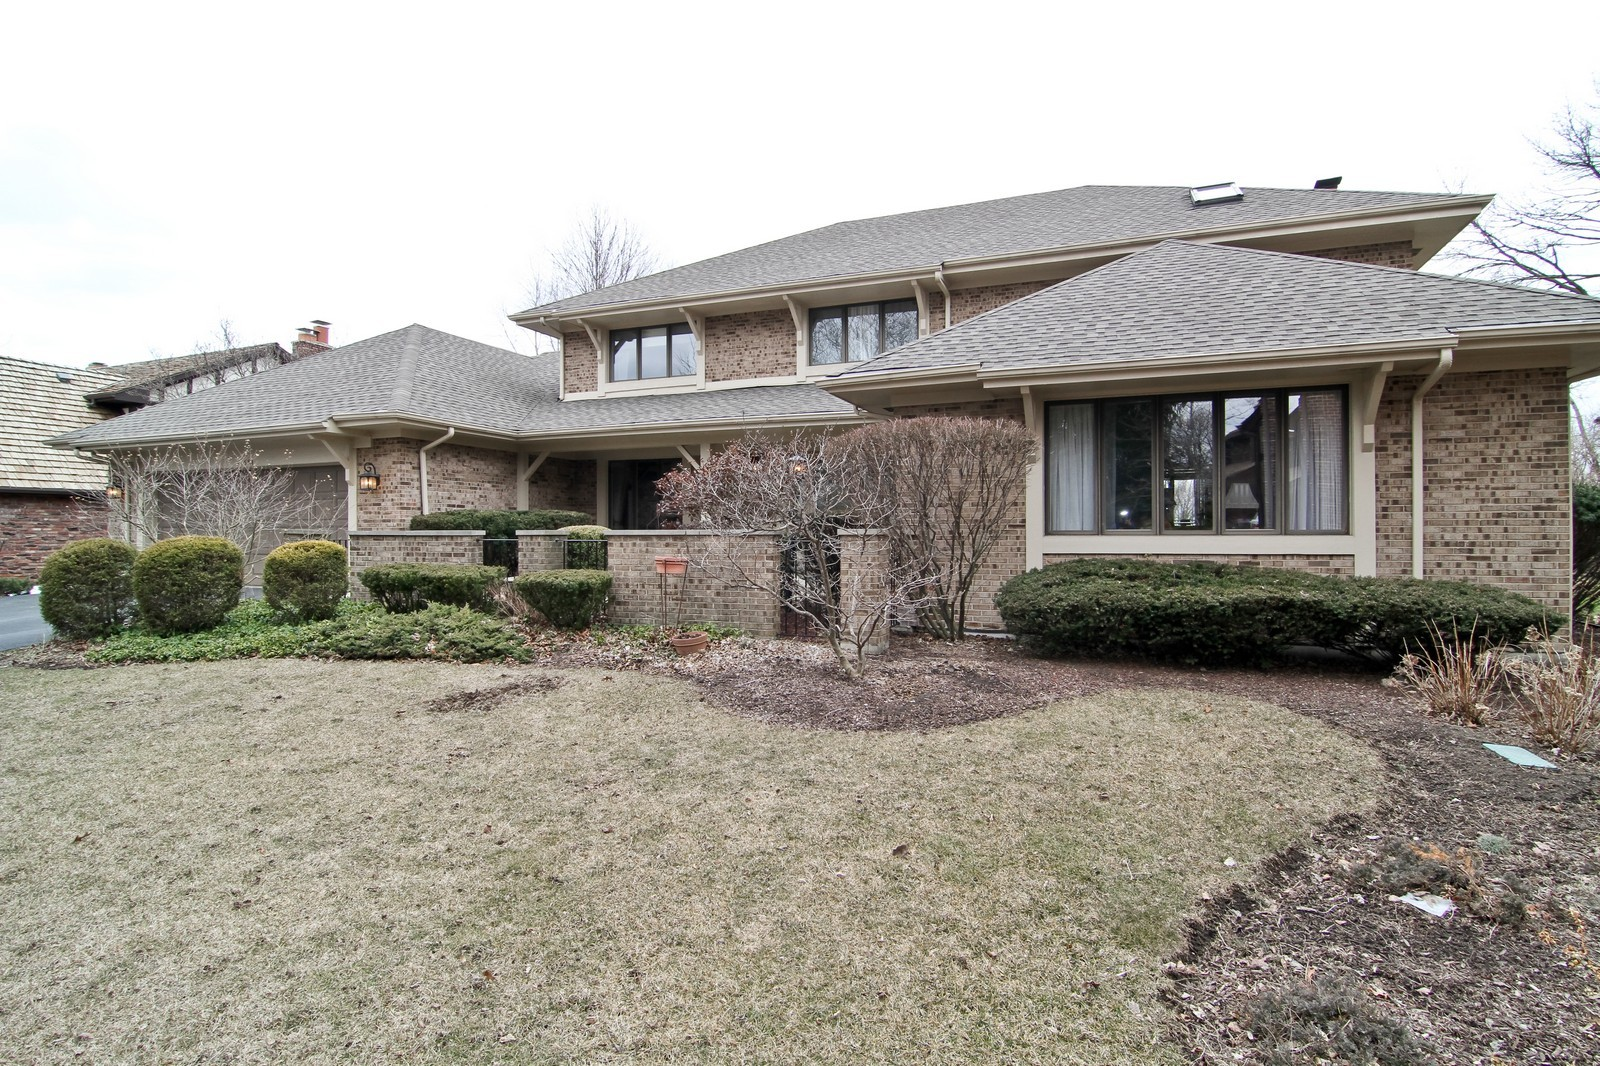 Real Estate Photography - 11554 Ridgewood Lane, Burr Ridge, IL, 60527 - Front View